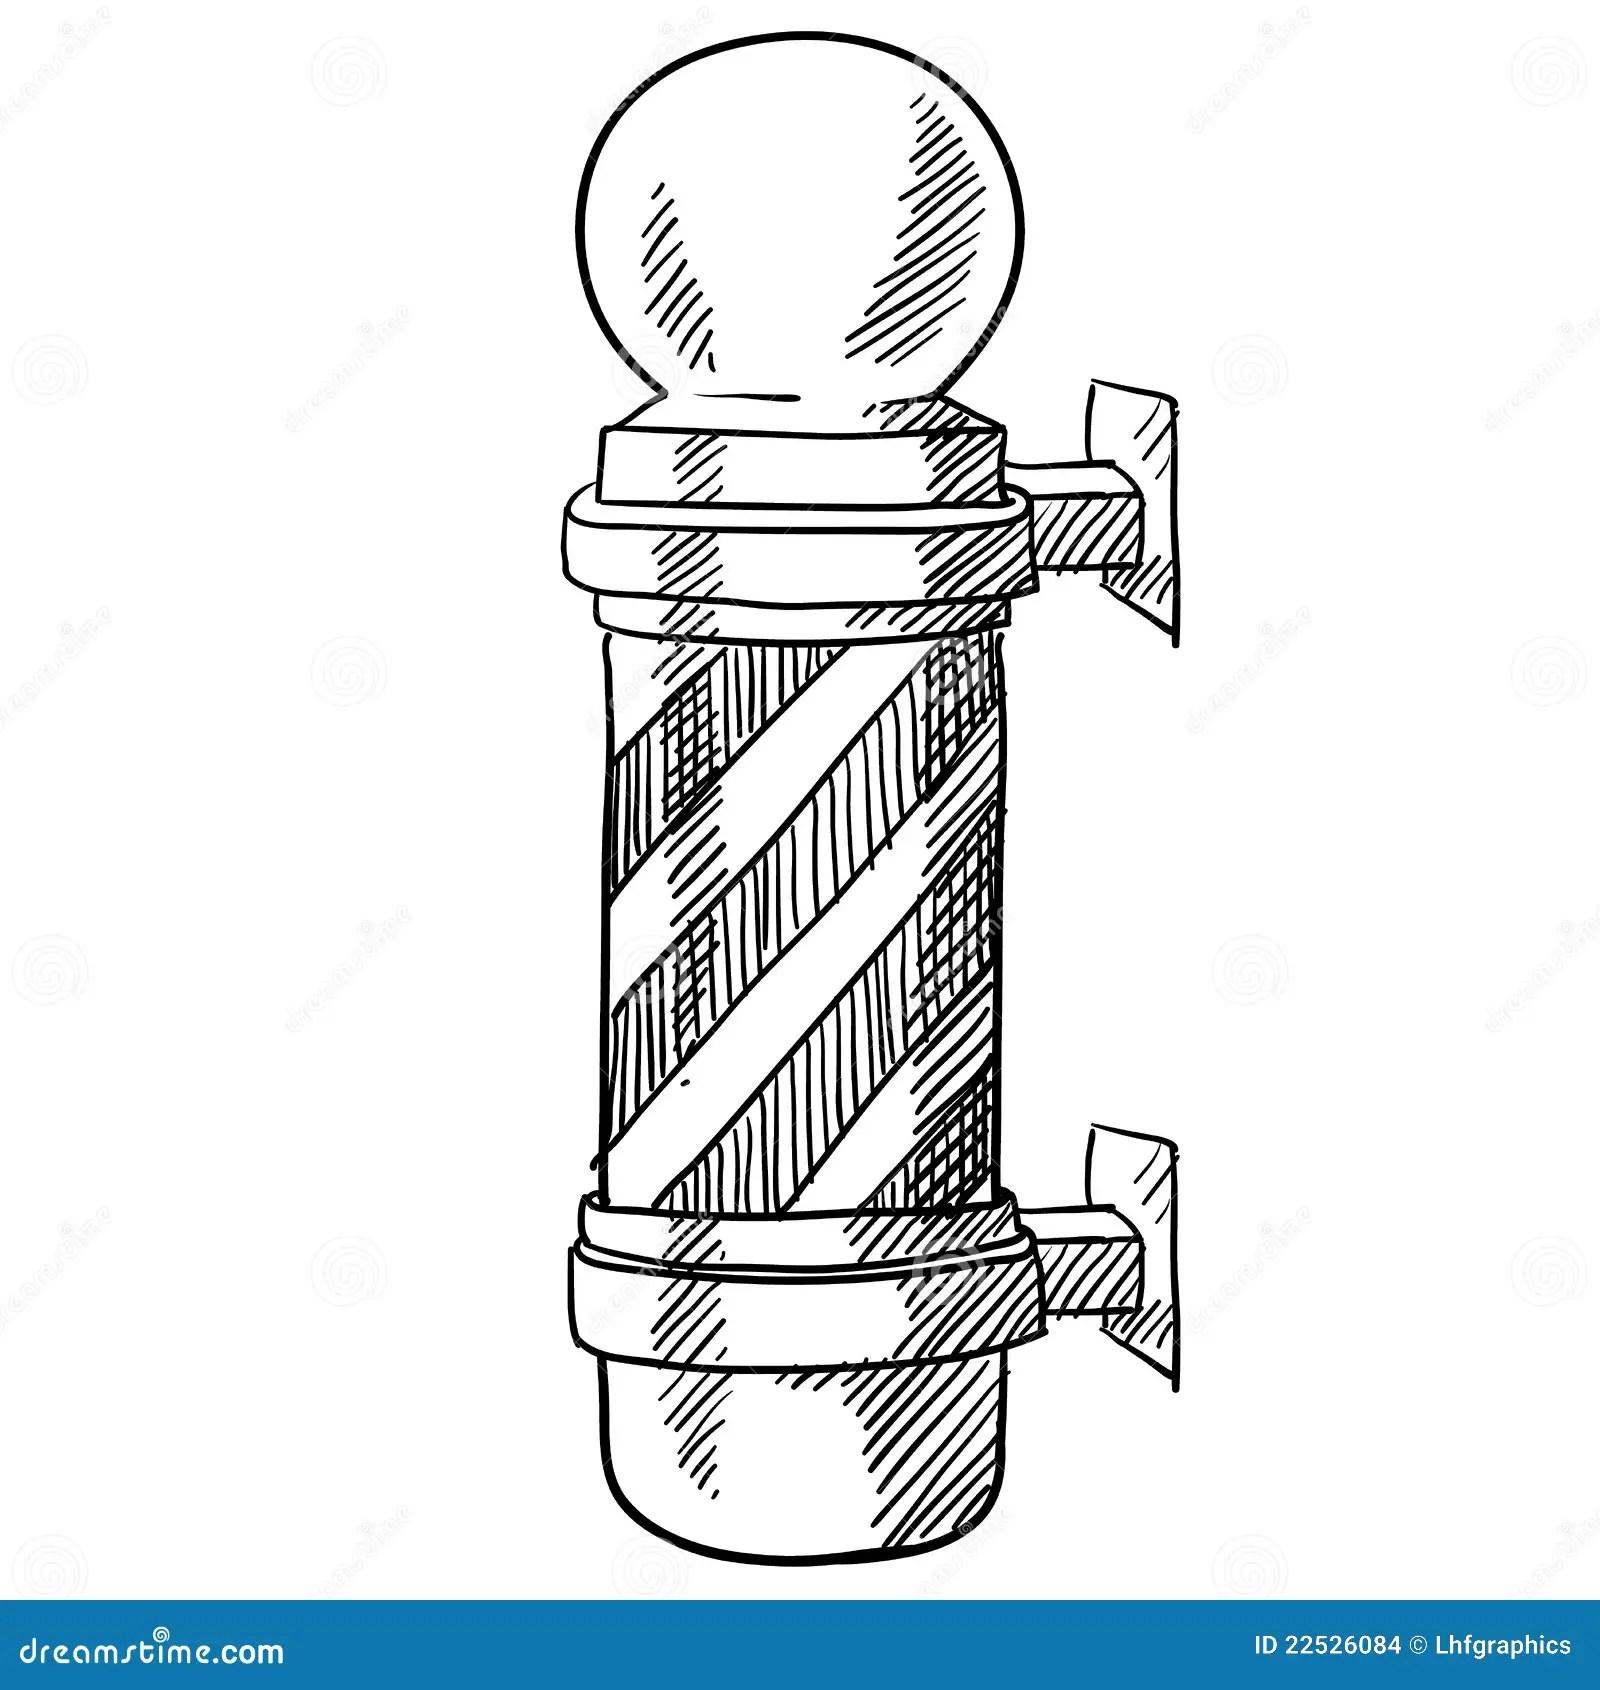 Barbershop Pole Sketch Stock Vector Illustration Of